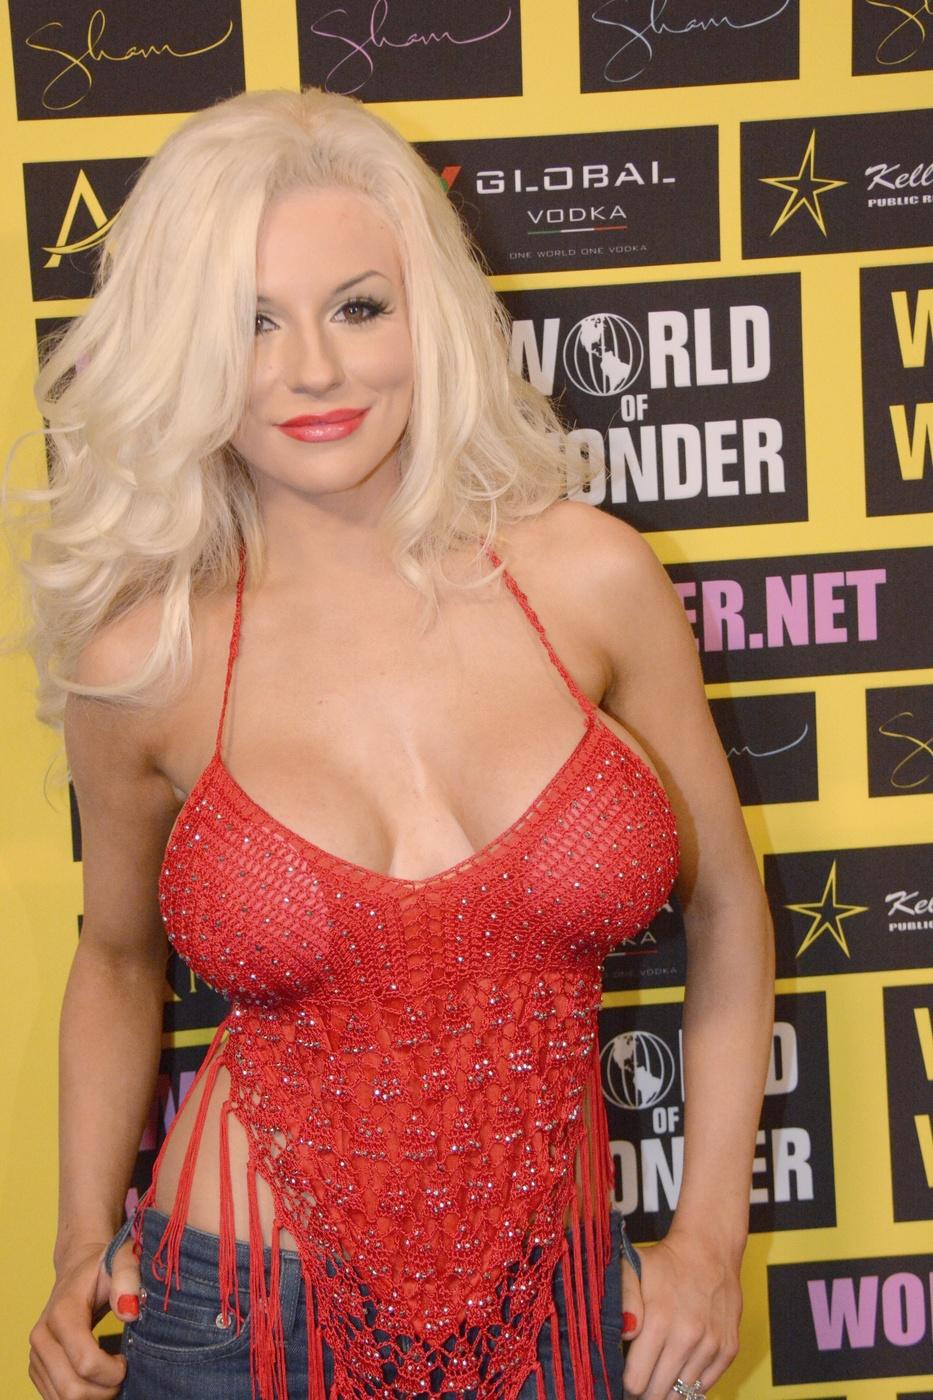 Alexis may big breast beauty hardplay - 1 7